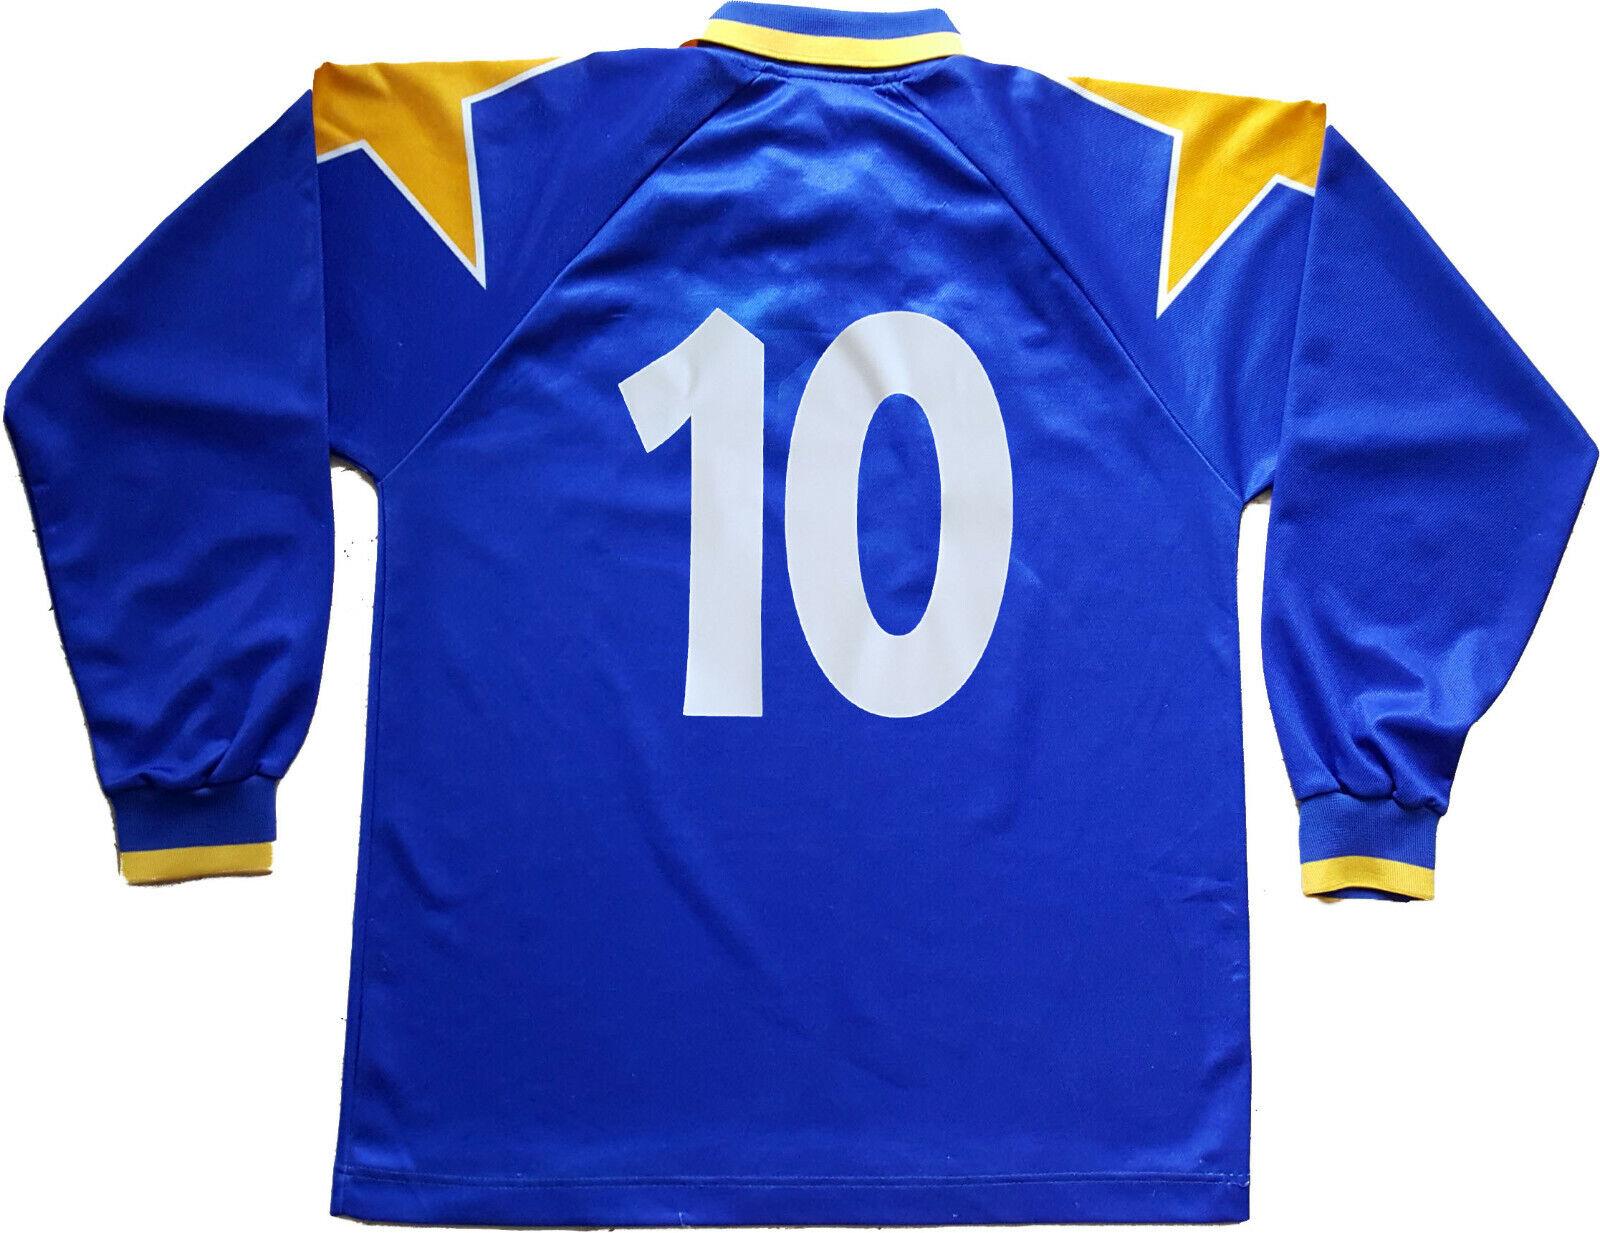 Maglia juventus borsagio Del Piero Kappa 199495 M Champions UCL  jersey vintage